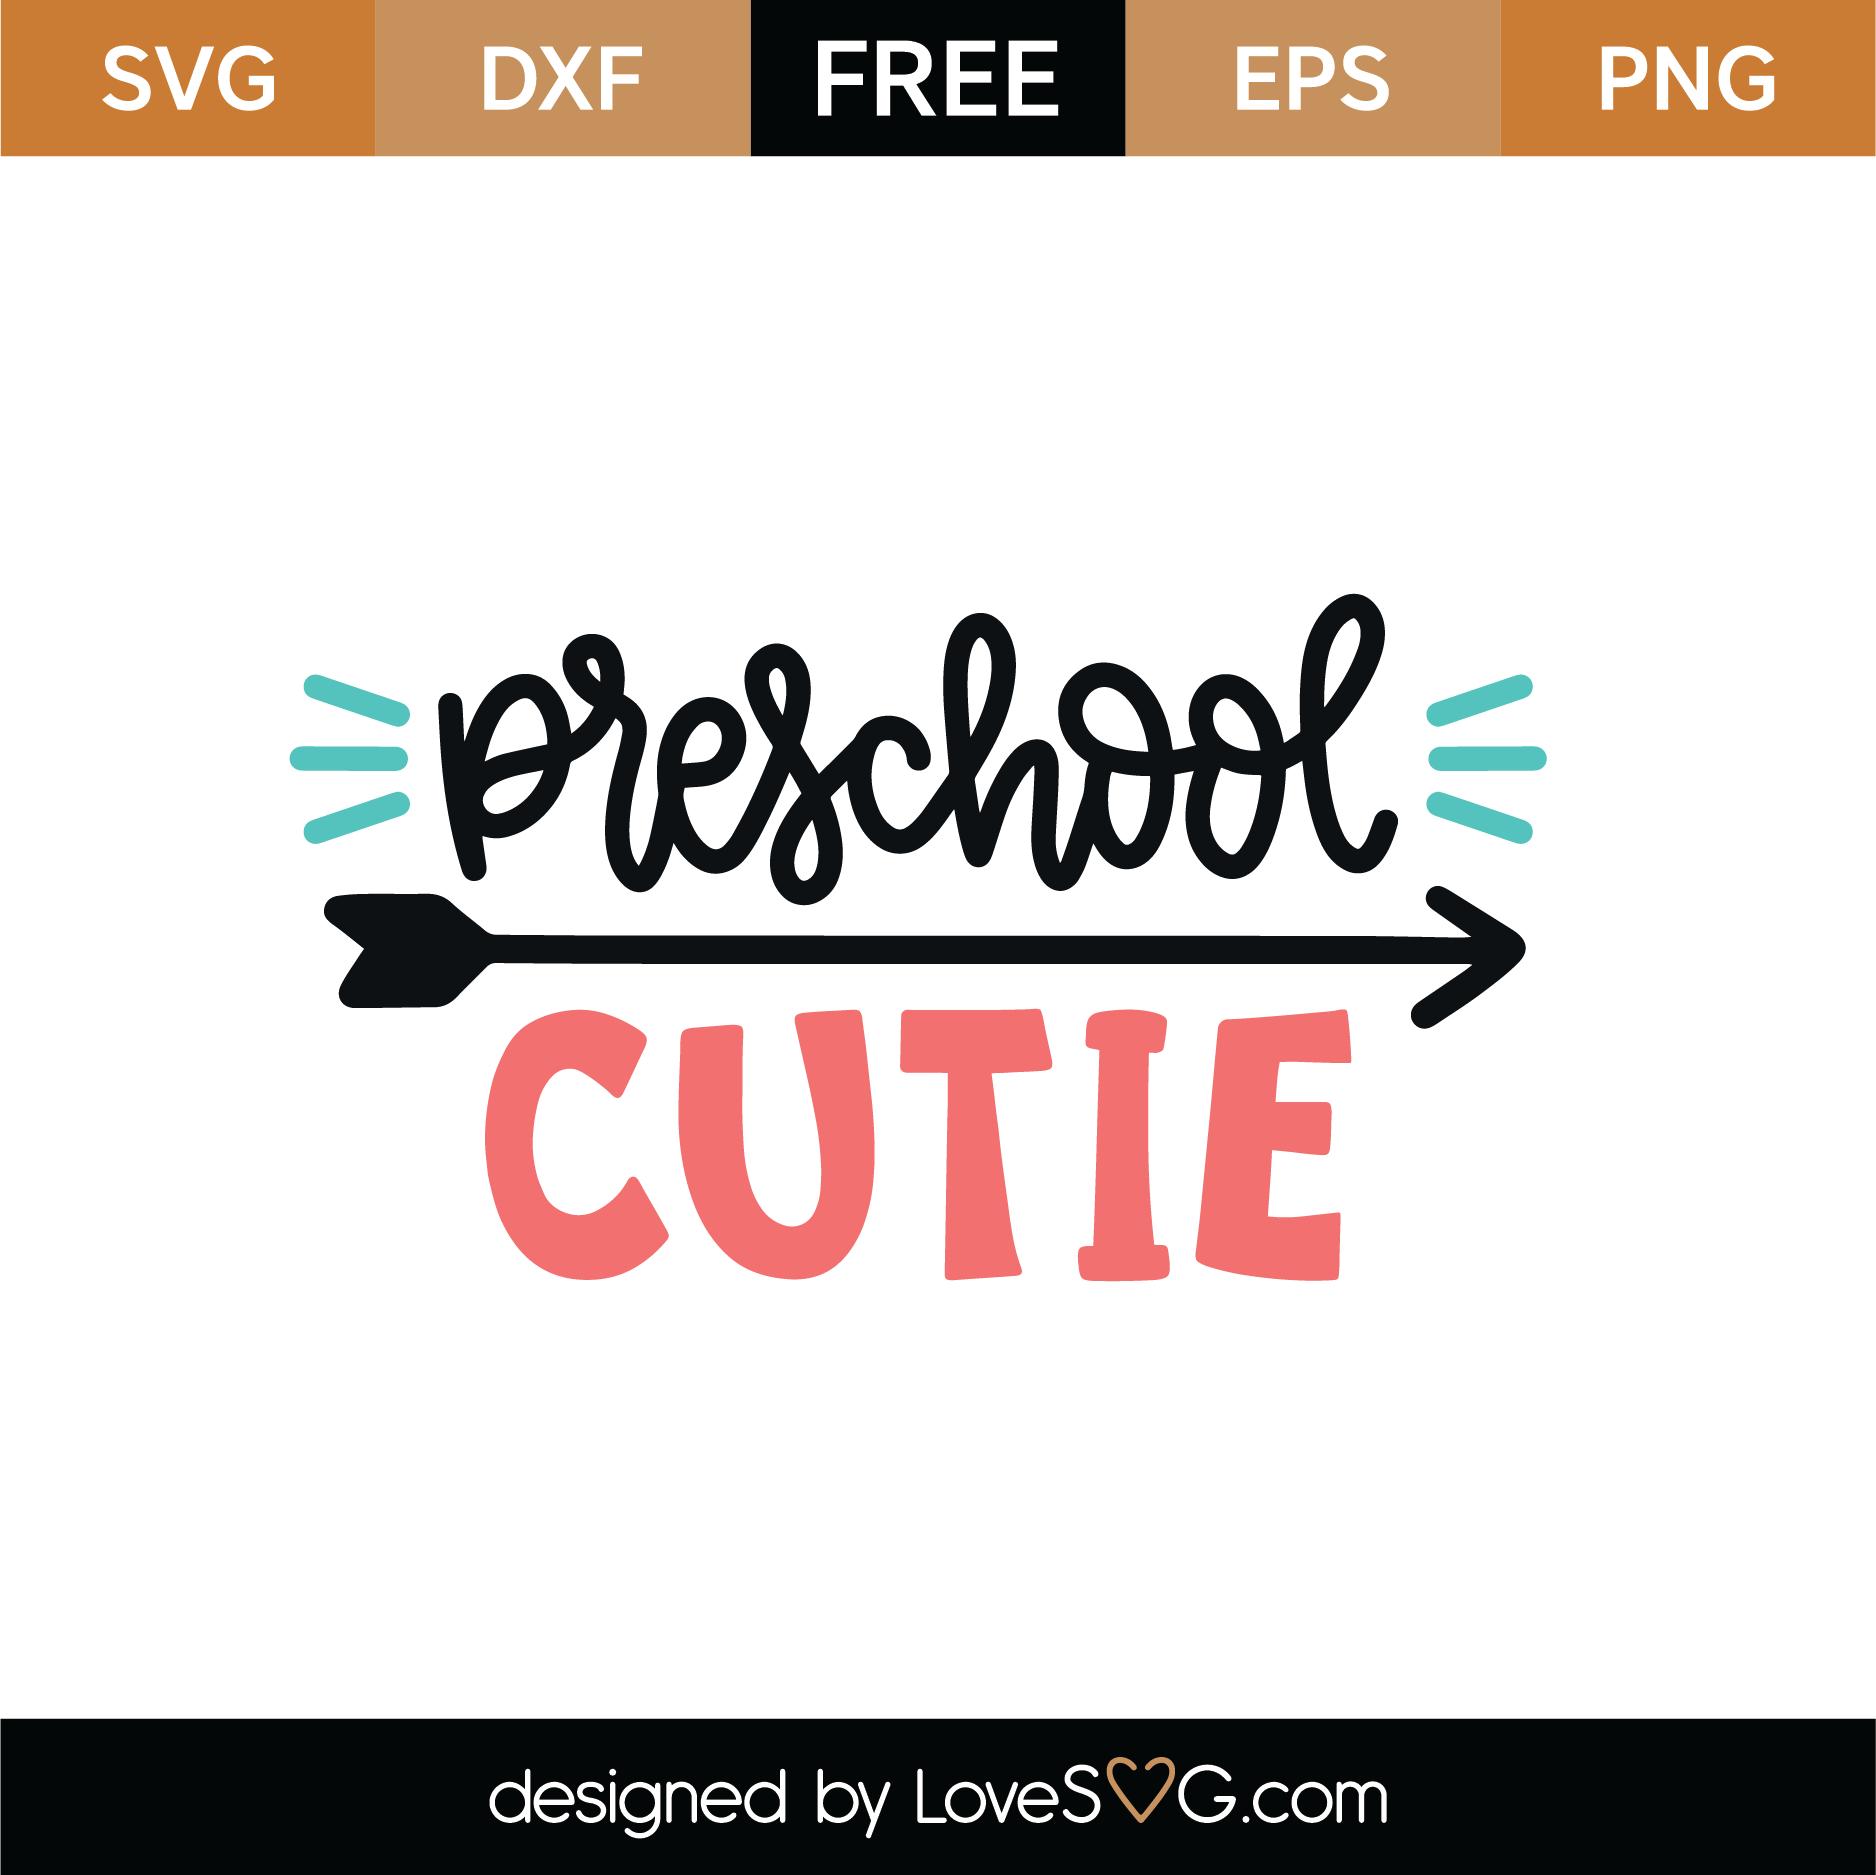 Download Free Preschool Cutie SVG Cut File | Lovesvg.com